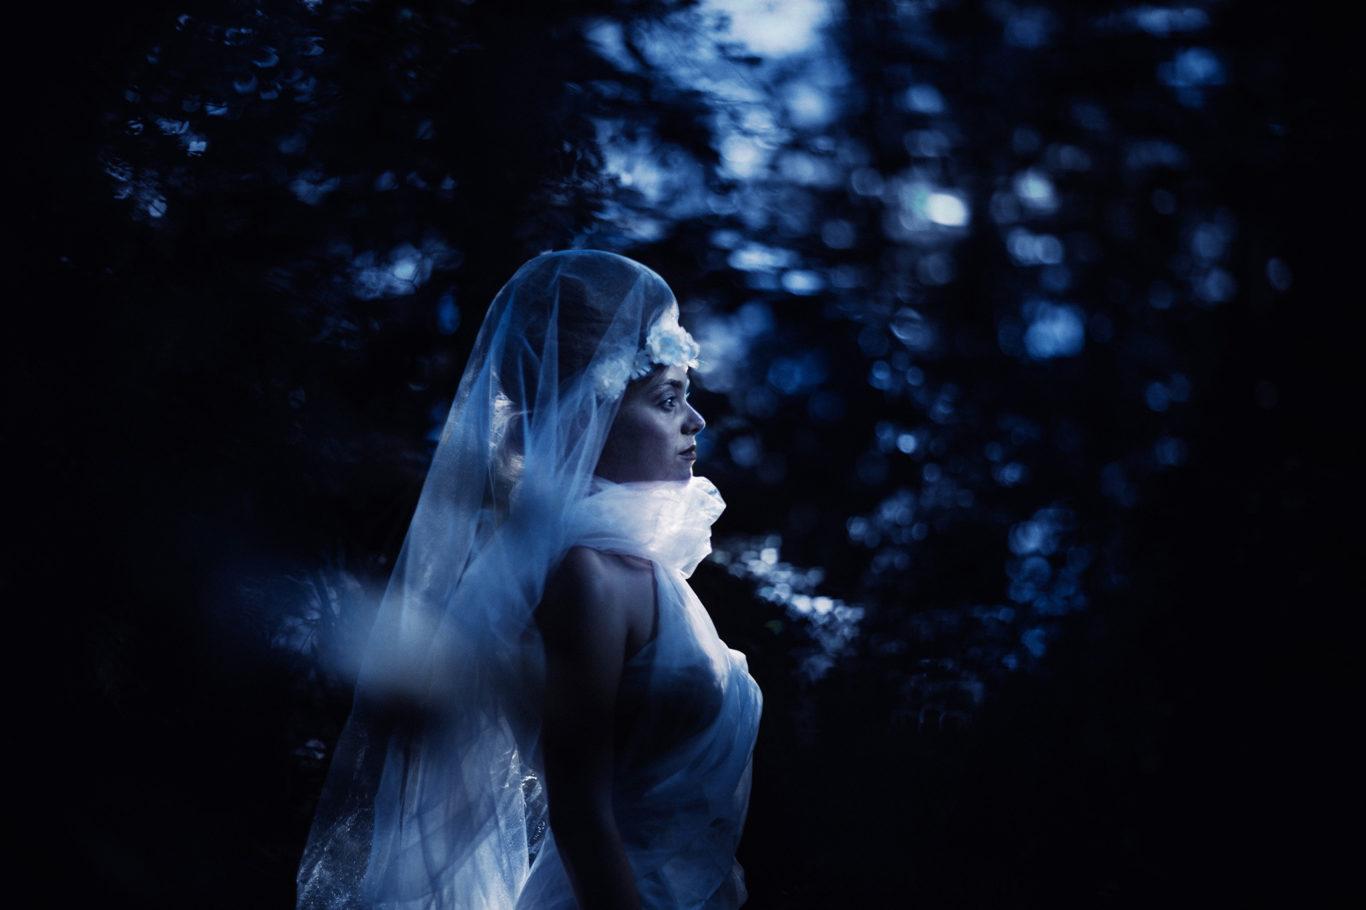 0107-Fotografie-fashion-Frozen-Queen-fotograf-Ciprian-Dumitrescu-DCF_5107